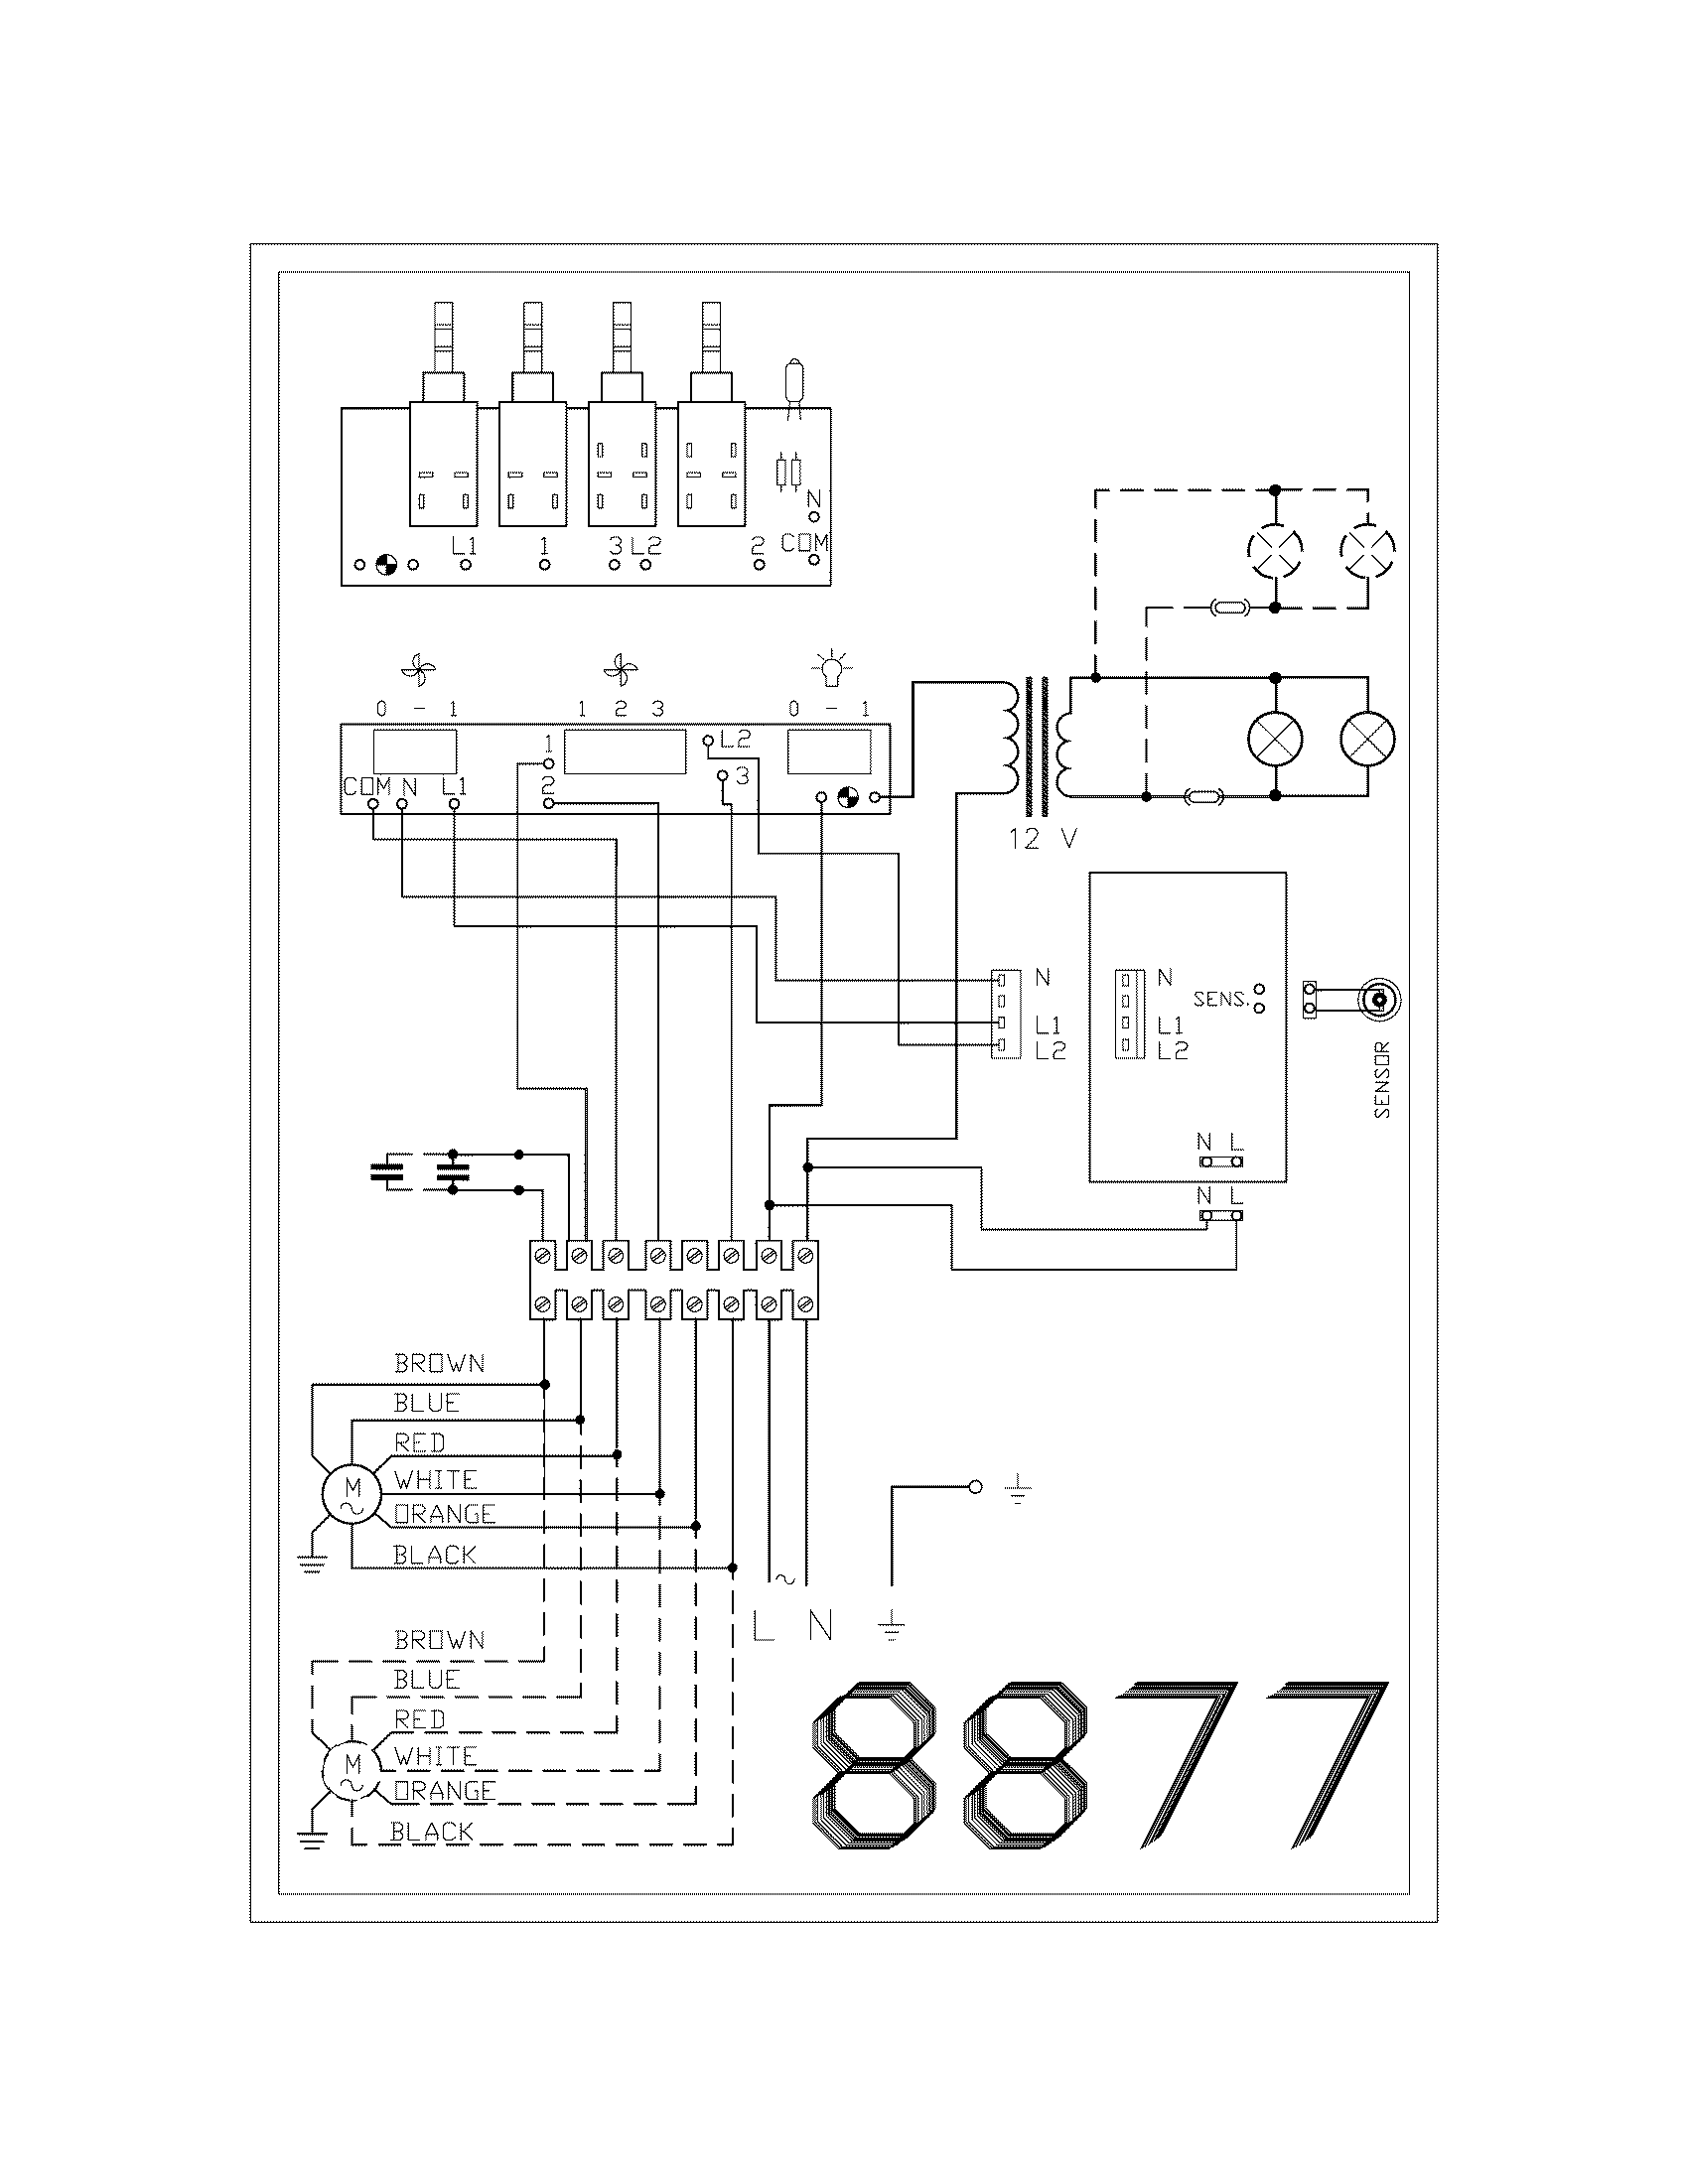 Honeywell Wiring Diagrams Honeywell 7800 Series Wiring Diagram Shunt